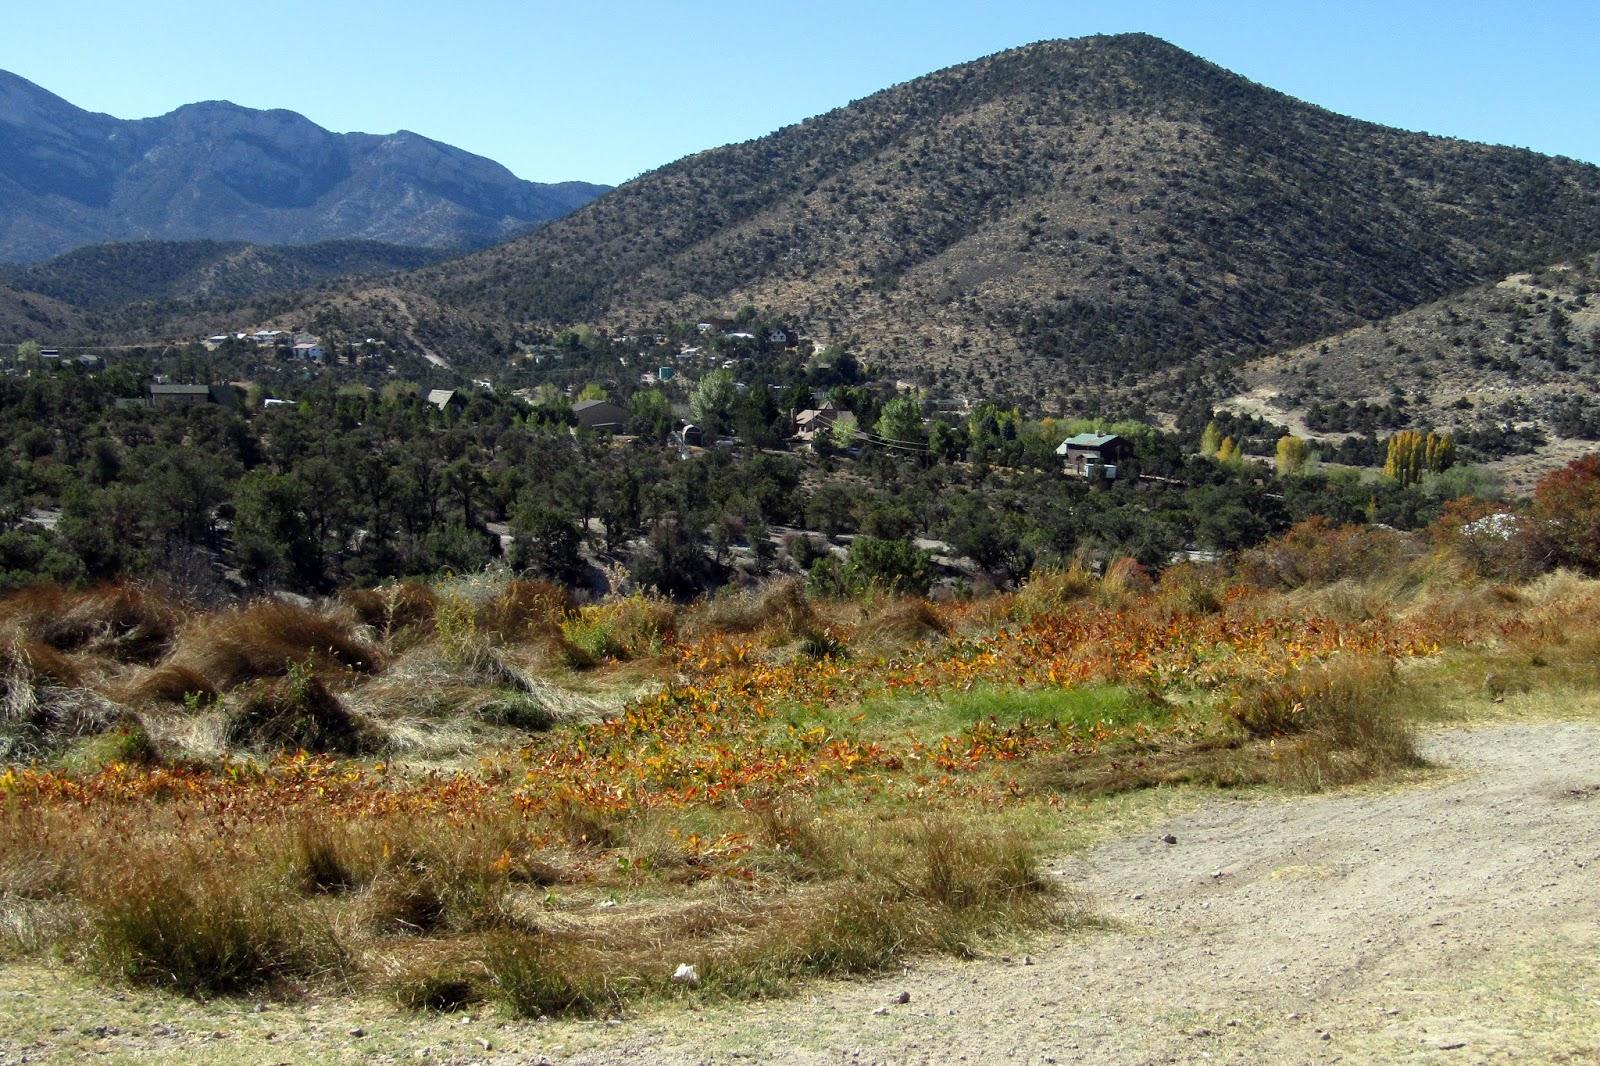 Around The Bend Friends Hiking Club Of Las Vegas: Mountain